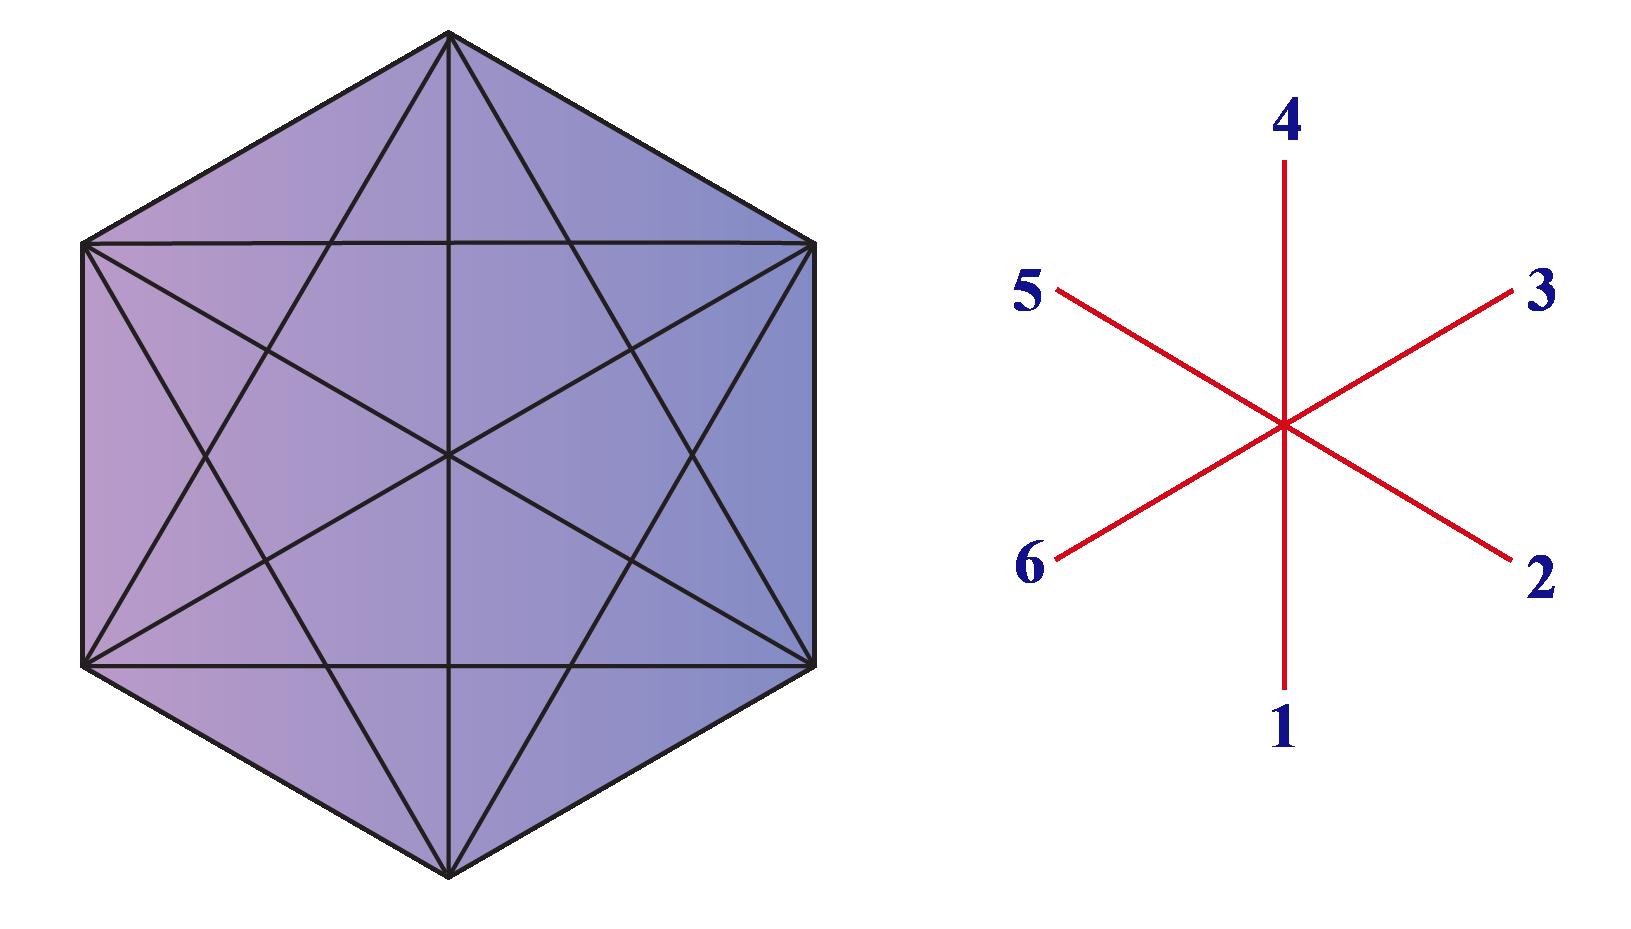 Diagonals in a hexagon